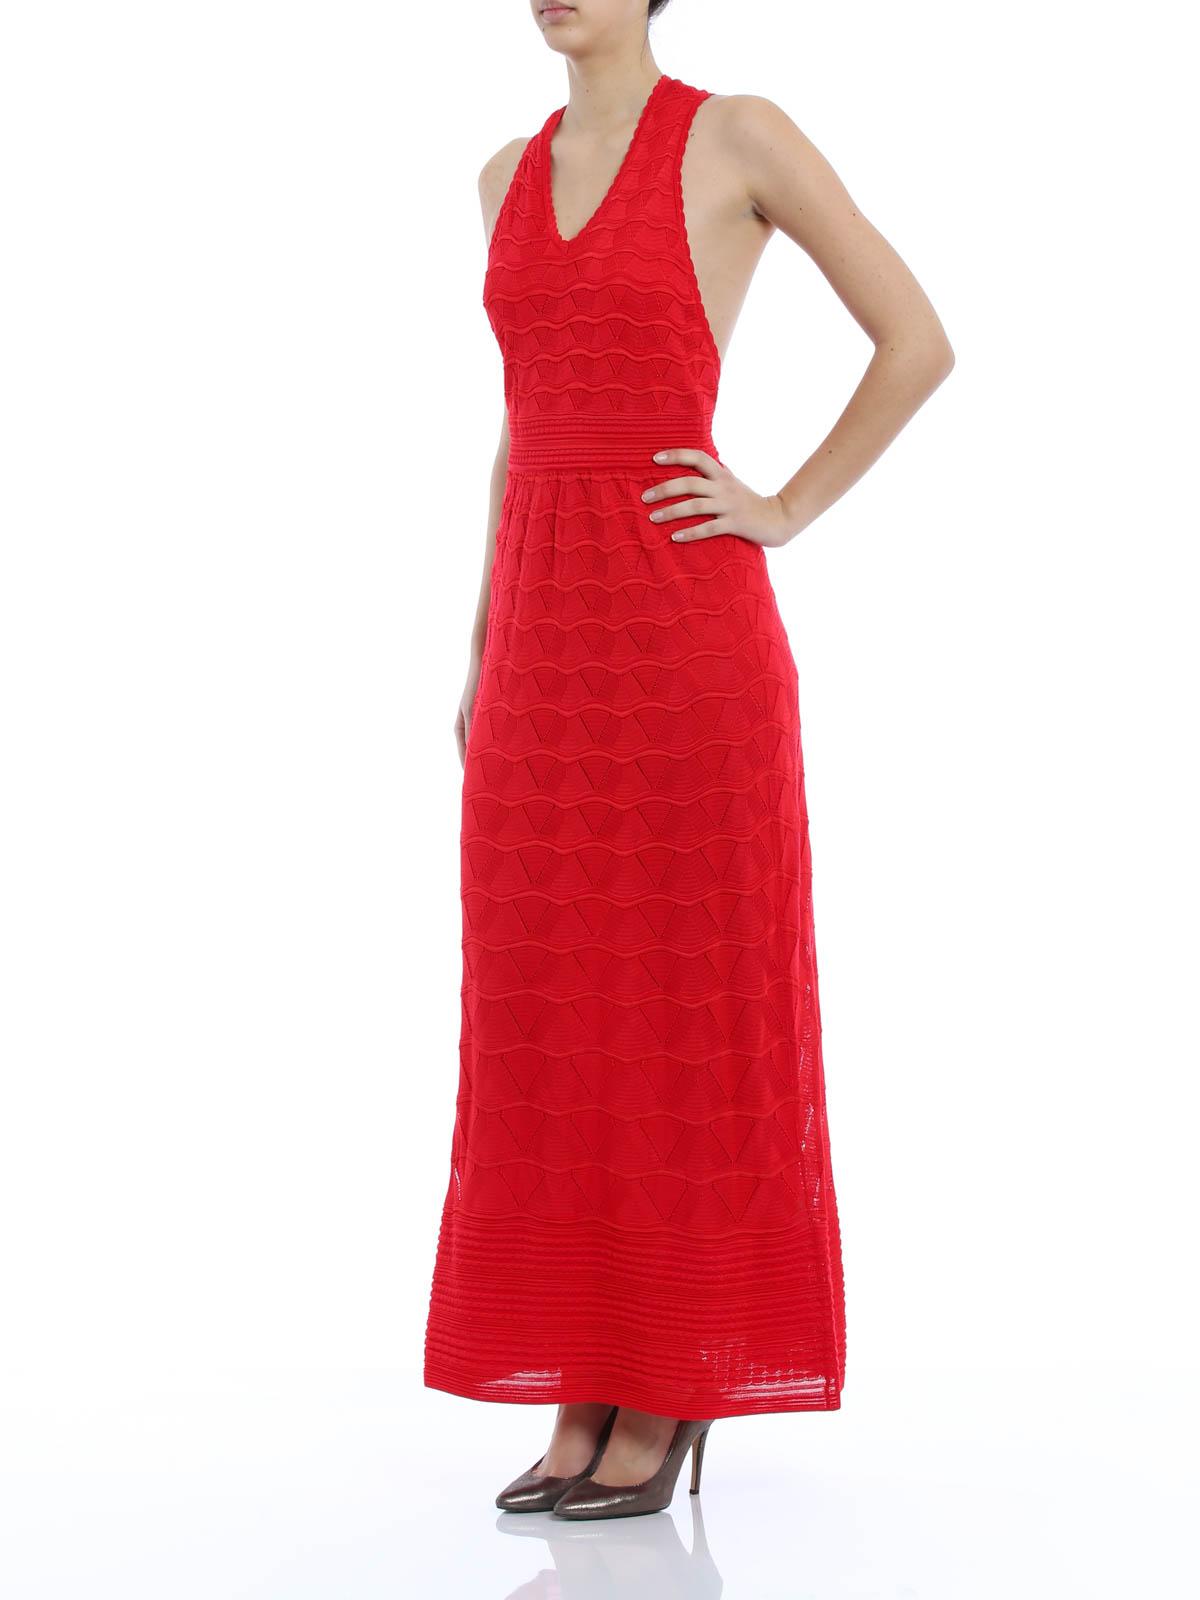 M Missoni - Chevron patterned dress - evening dresses - KD0KD15022P 947